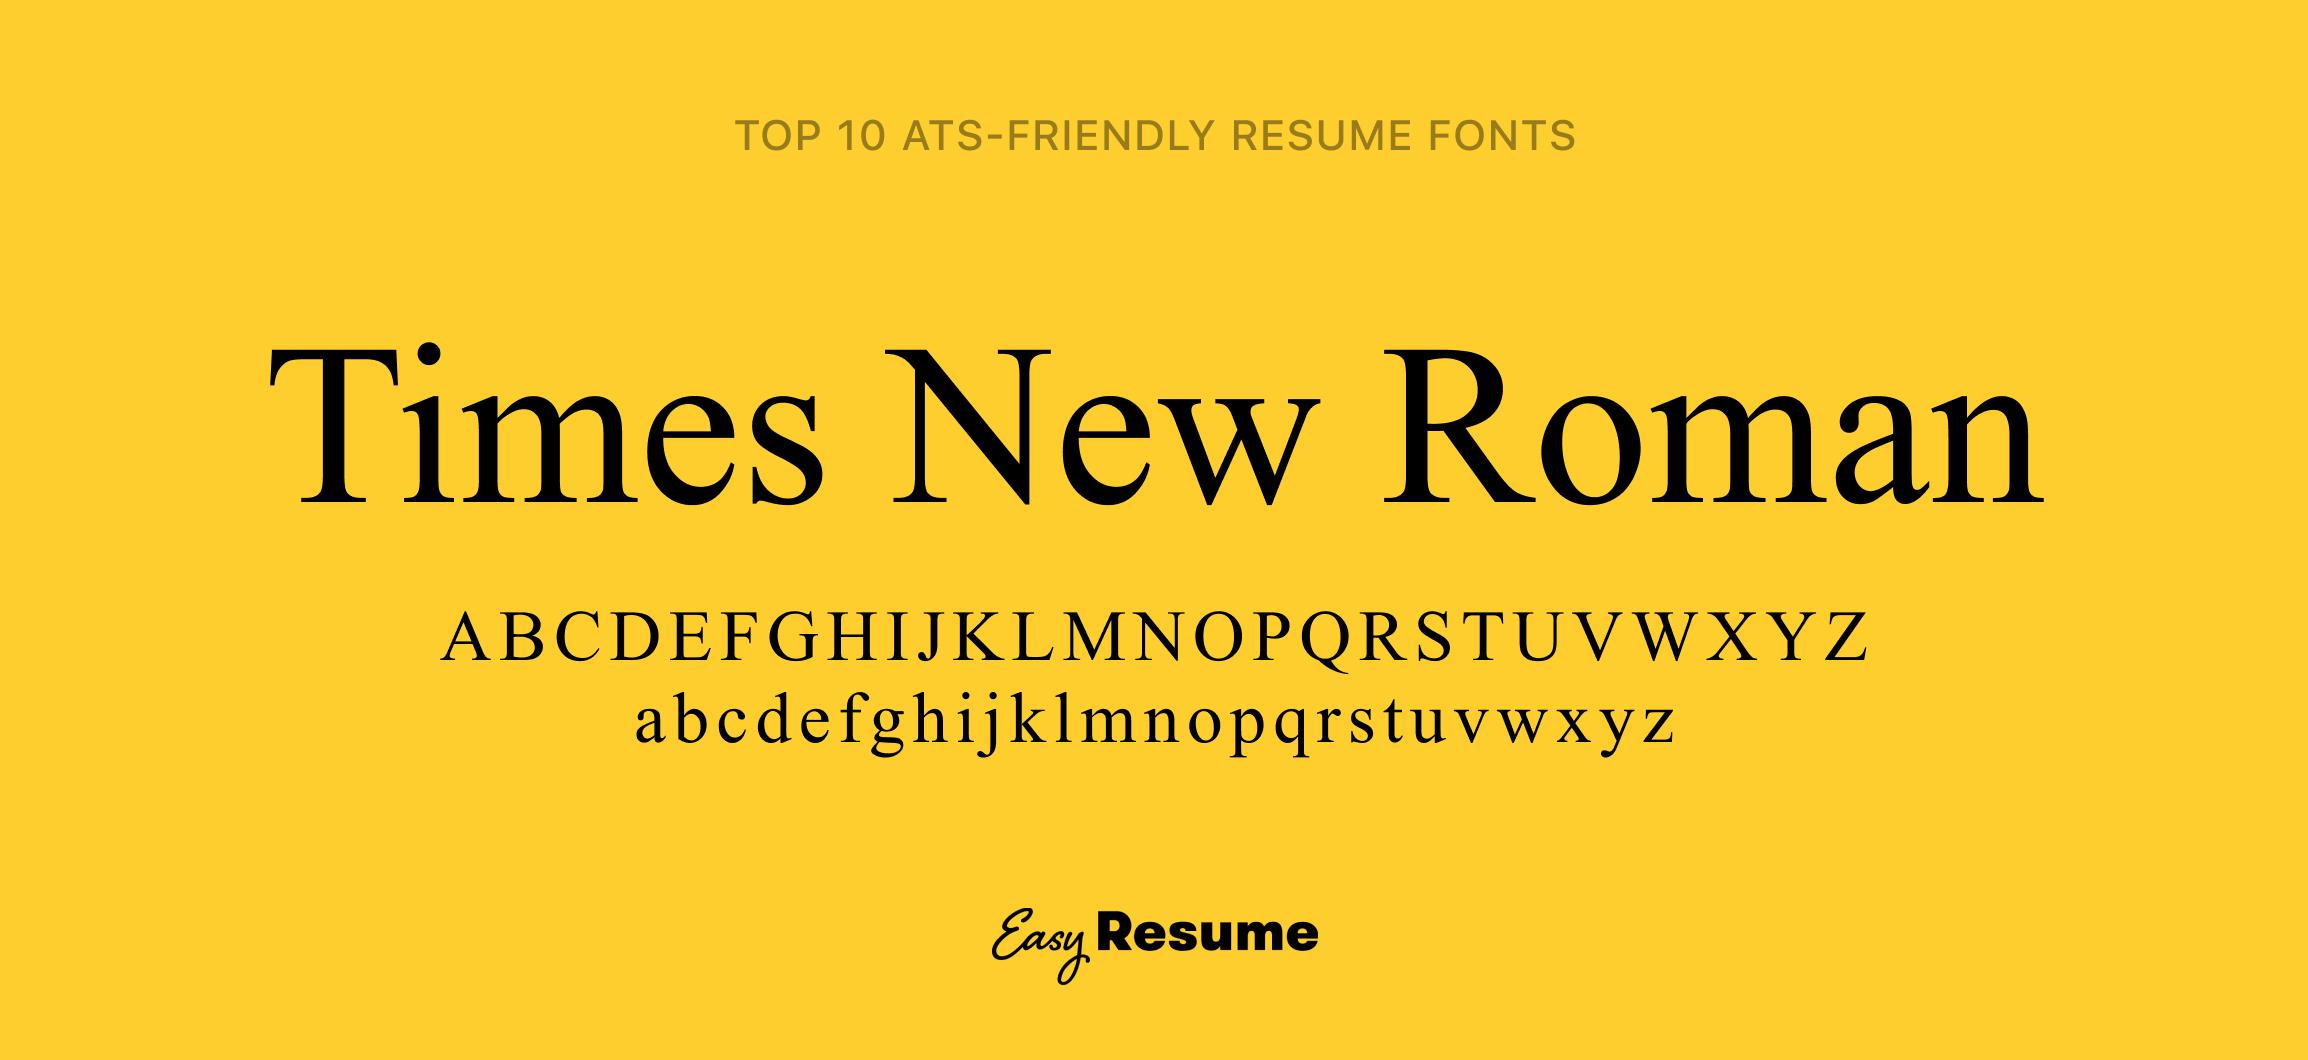 Times New Roman Resume Font